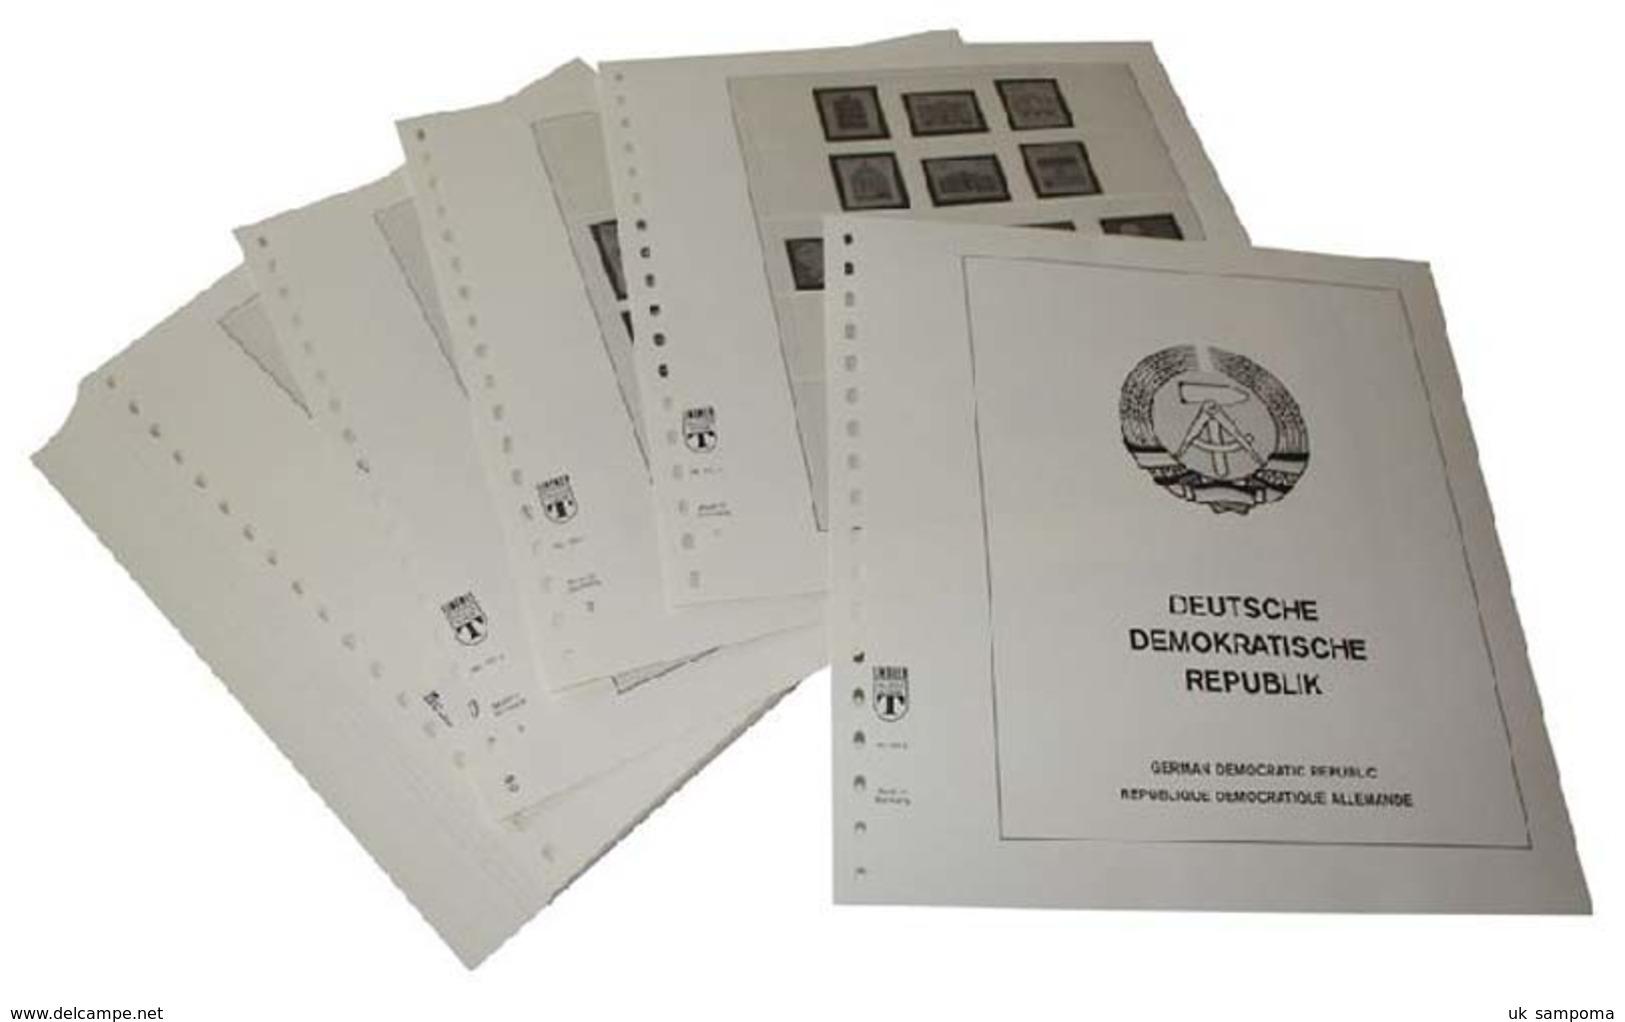 Lindner 121 Germany Complete Offer East Germany GDR - Illustrated Album Pages Year 1949-1990 - Albums & Binders